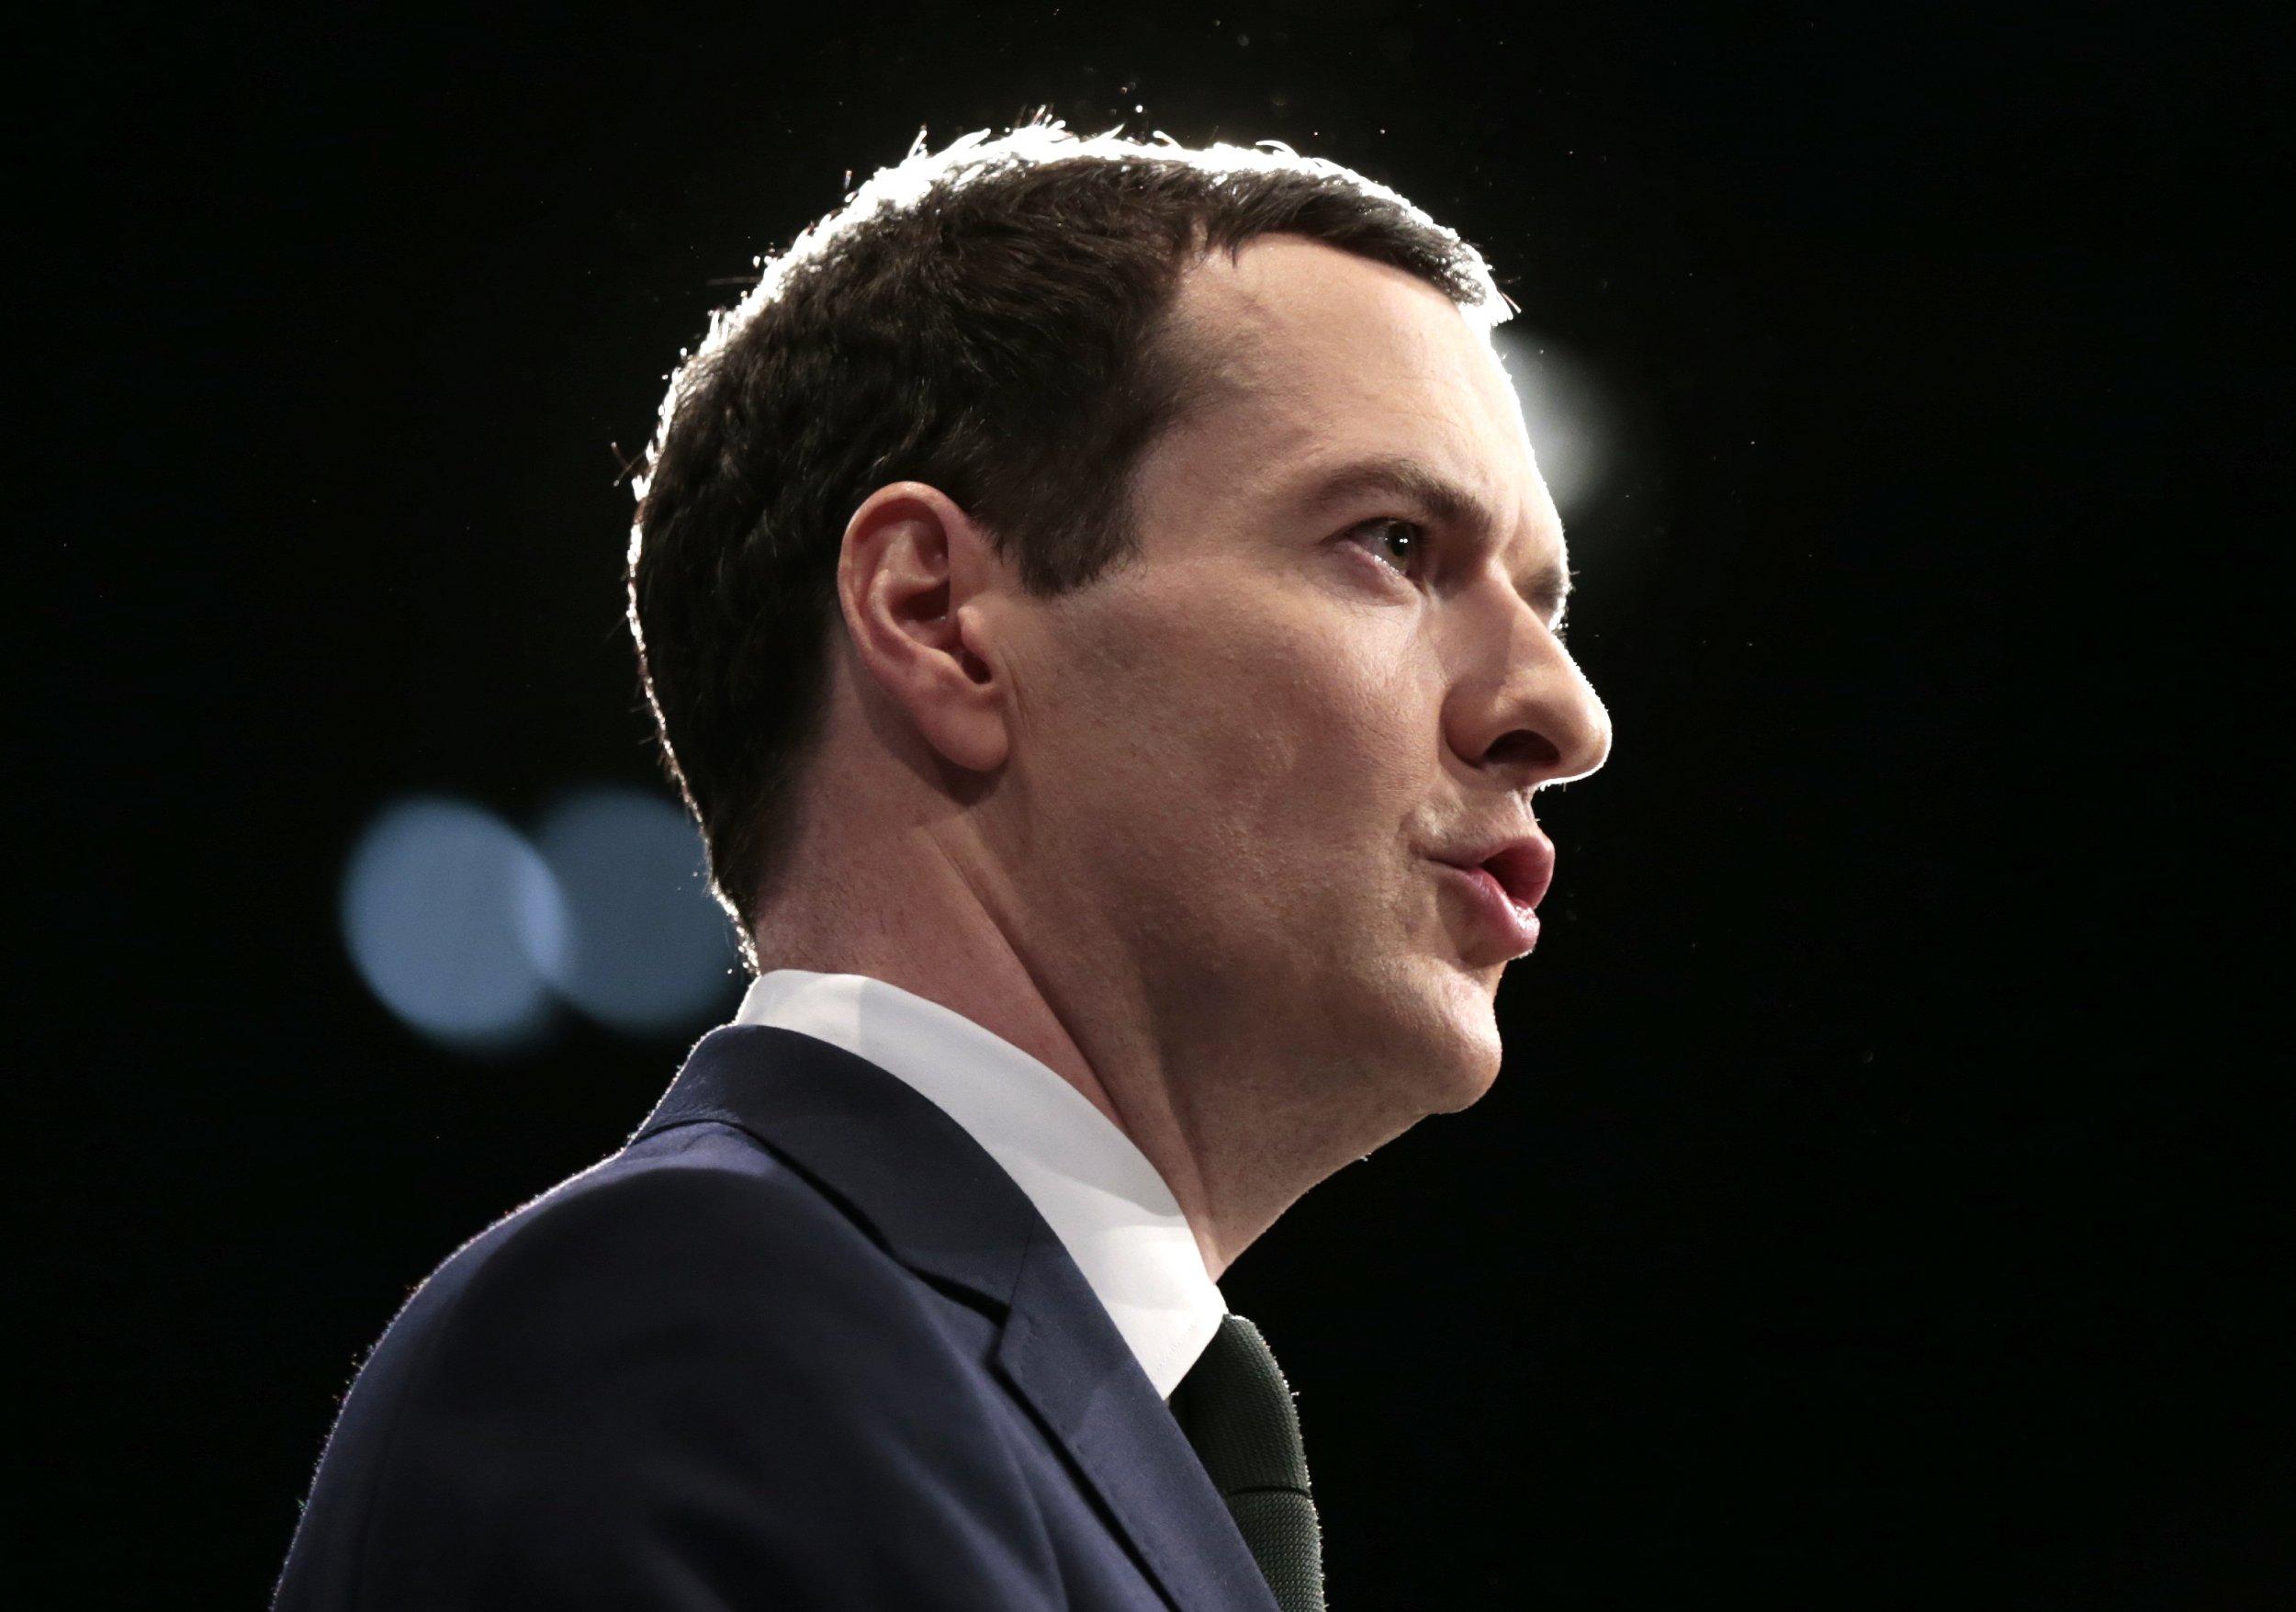 Osborne ISIS Cyber Hackers